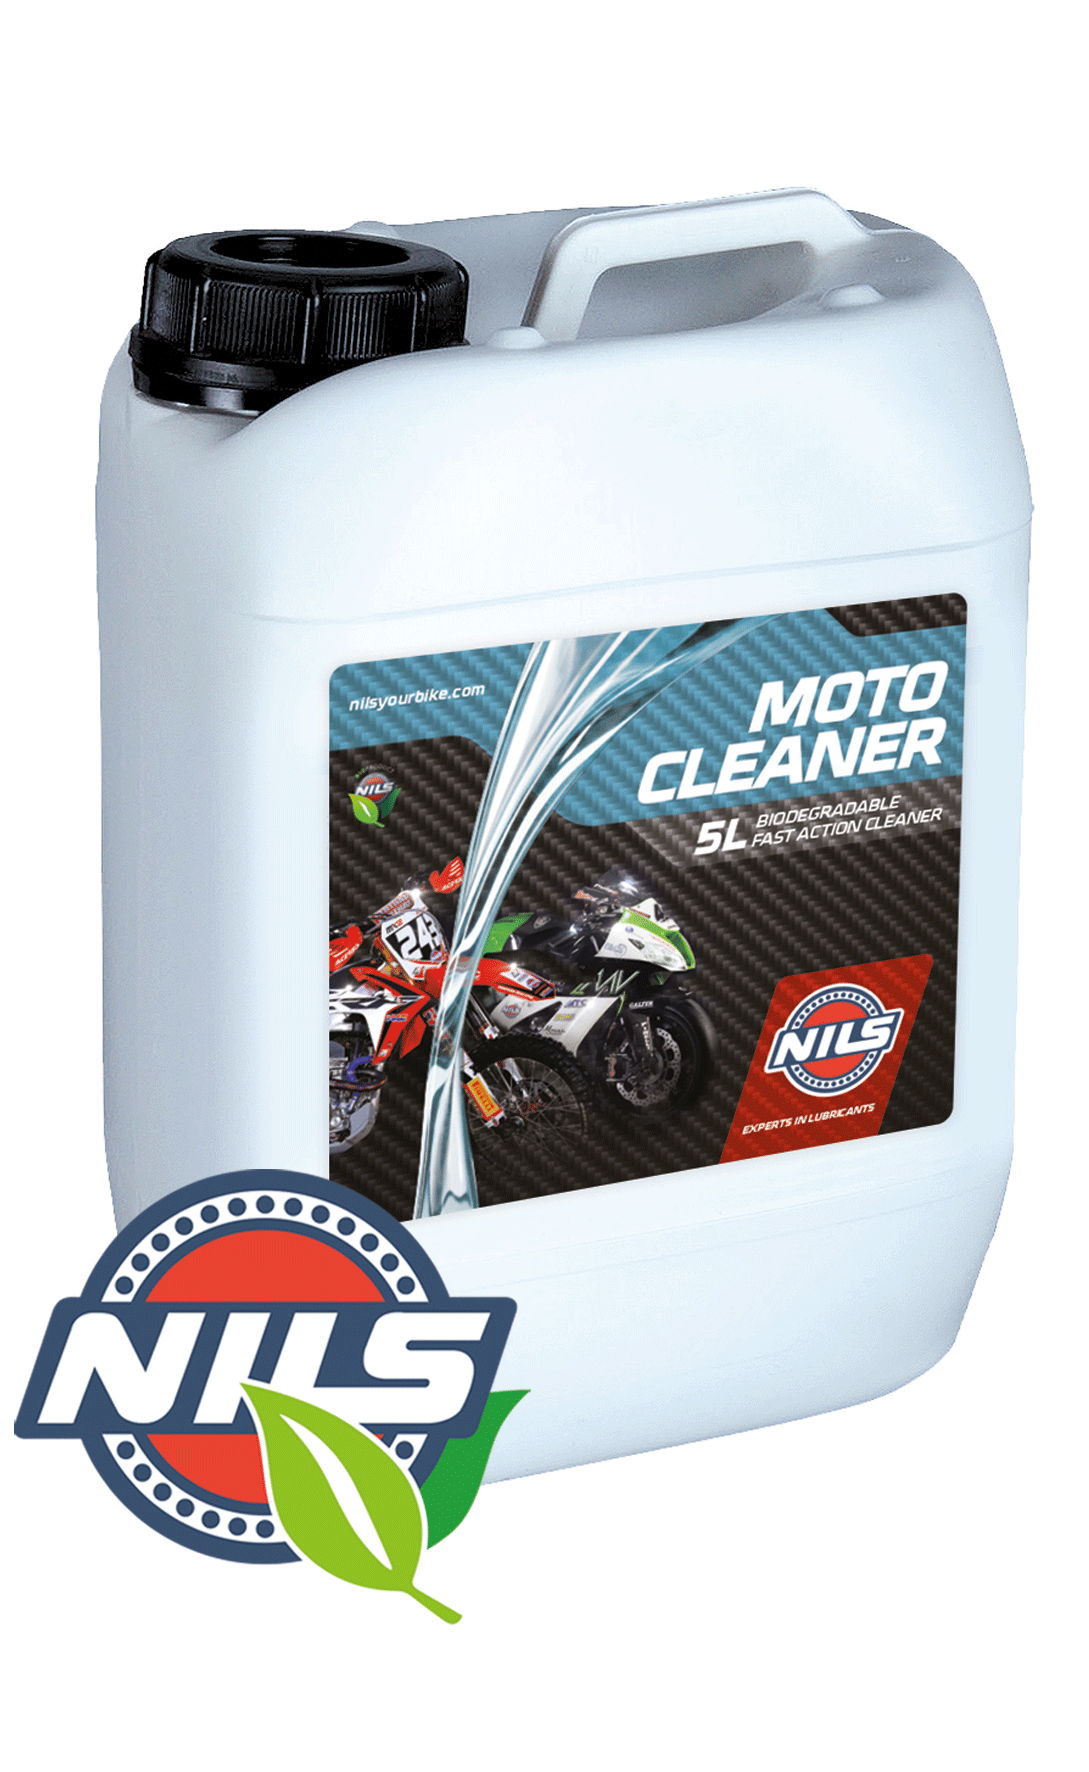 MOTO CLEANER